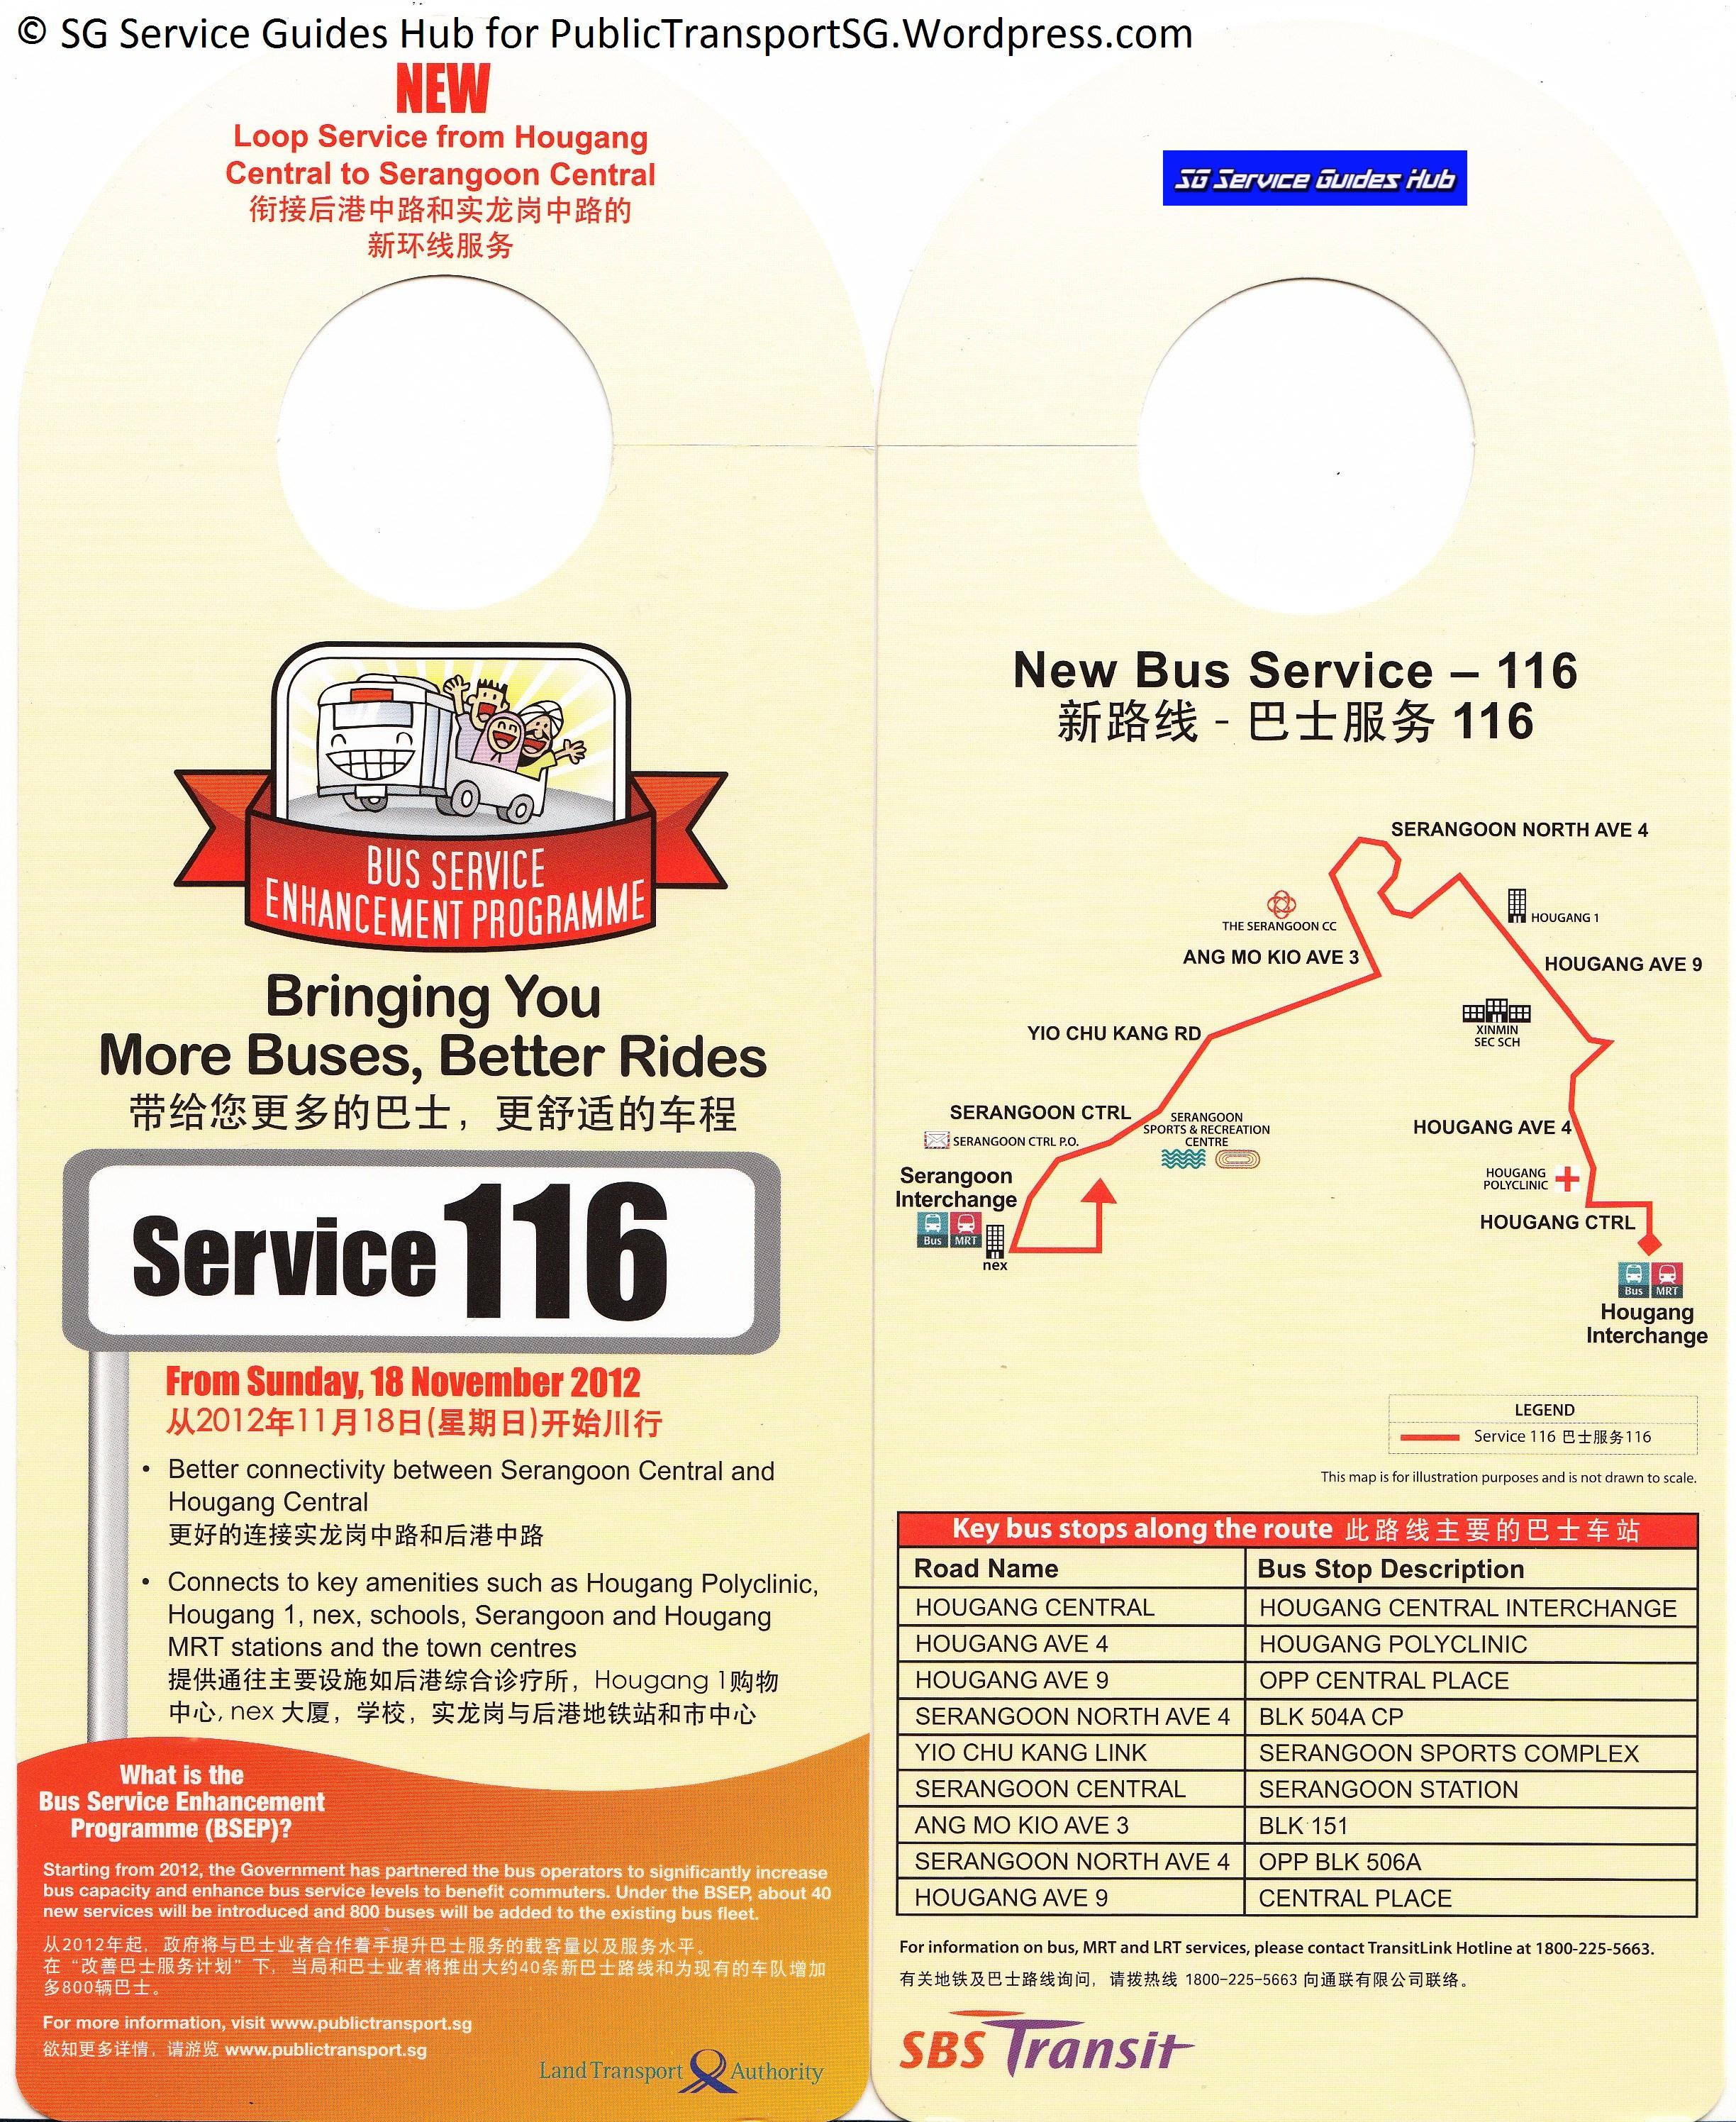 BSEP Promotional Hanger for Service 116